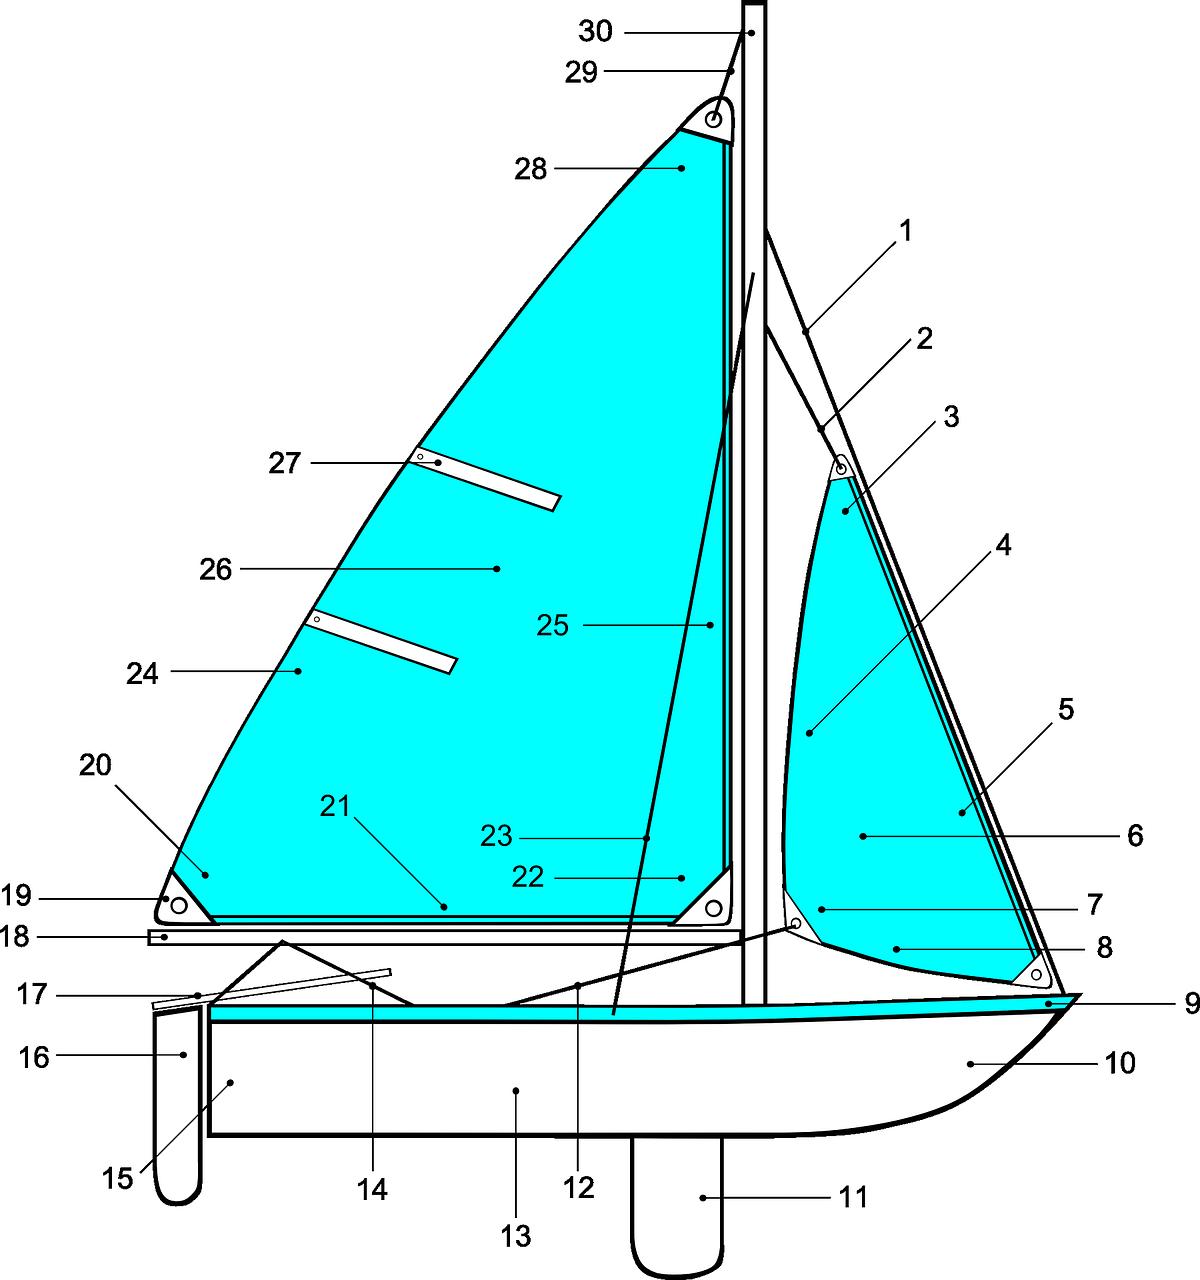 medium resolution of boat diagram sailboat sailing points boat boat diagram sailboat sailing points boat